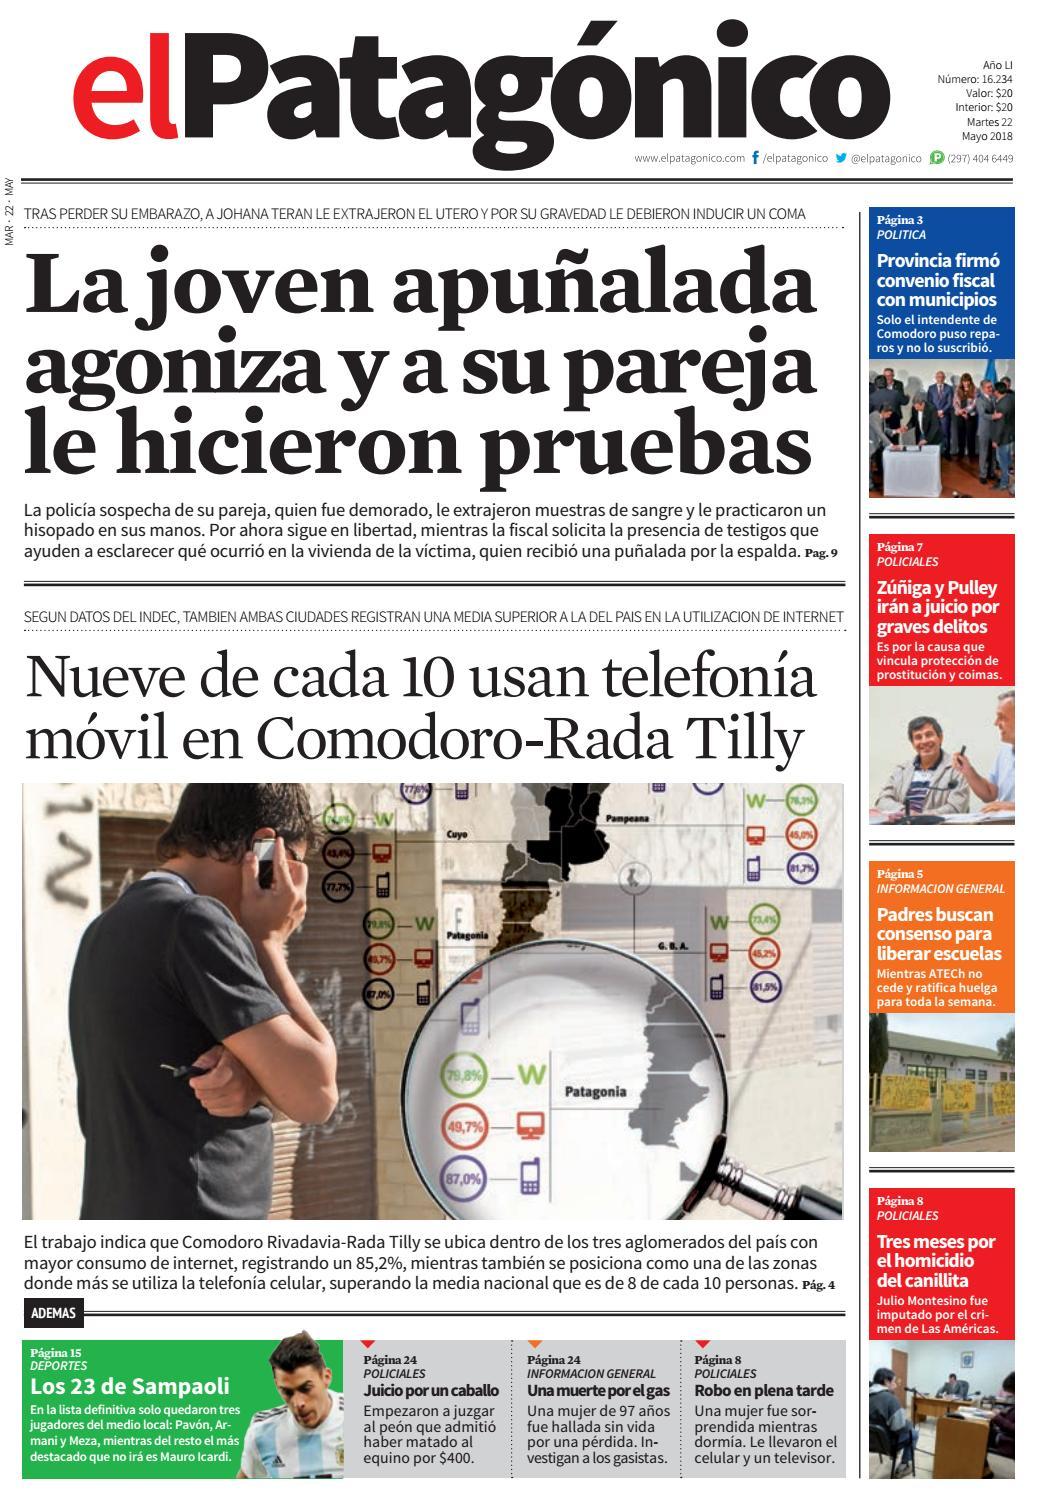 edicion220021052018.pdf by El Patagonico - issuu